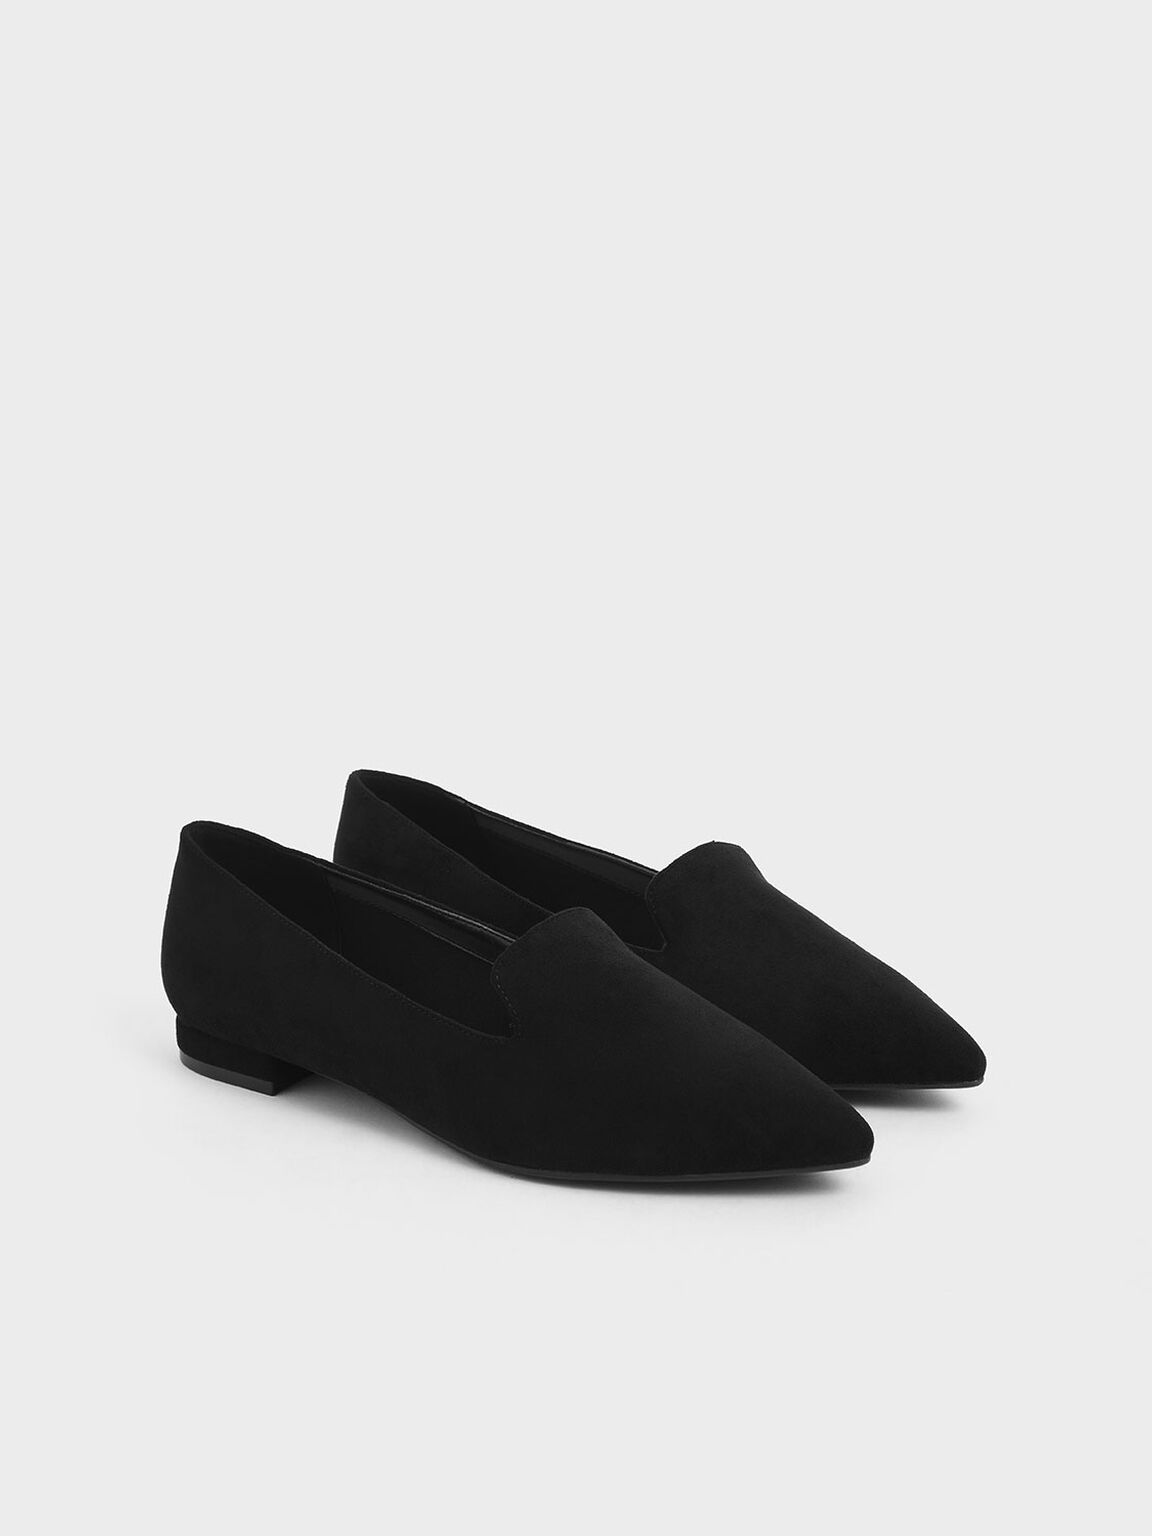 Textured Pointed Toe Loafer Flats, Black, hi-res